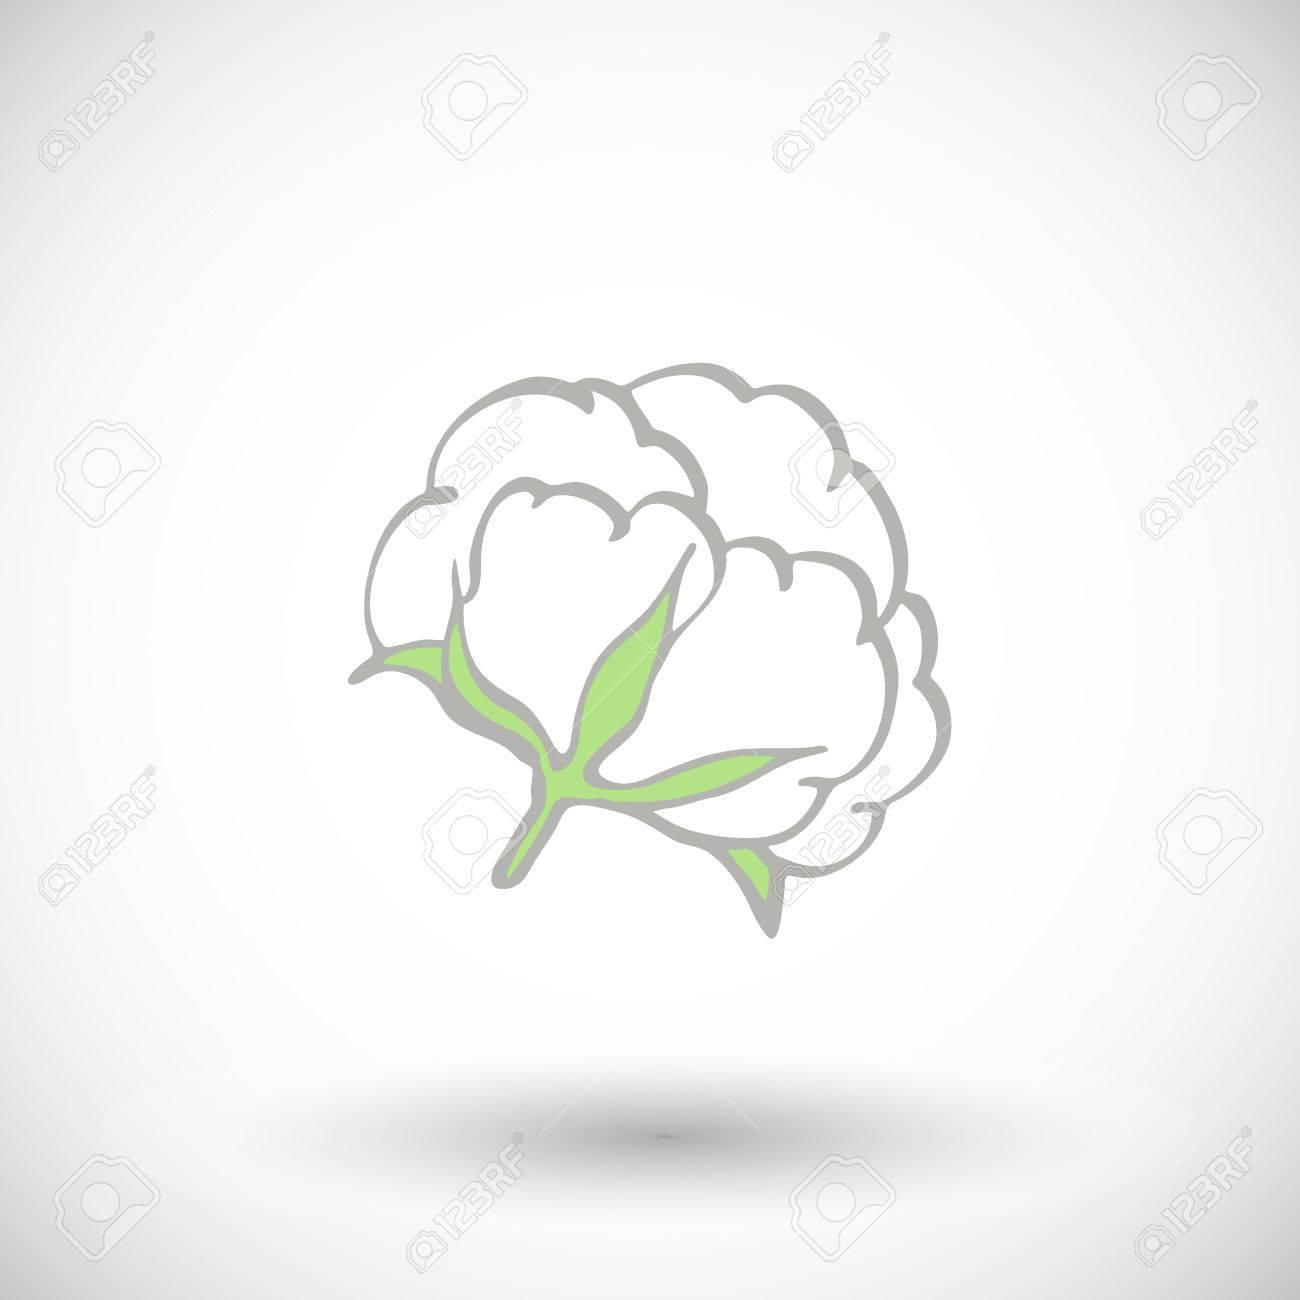 Fleur De Coton Hand Drawn Icone De Coton Biologique Dessin Doodle